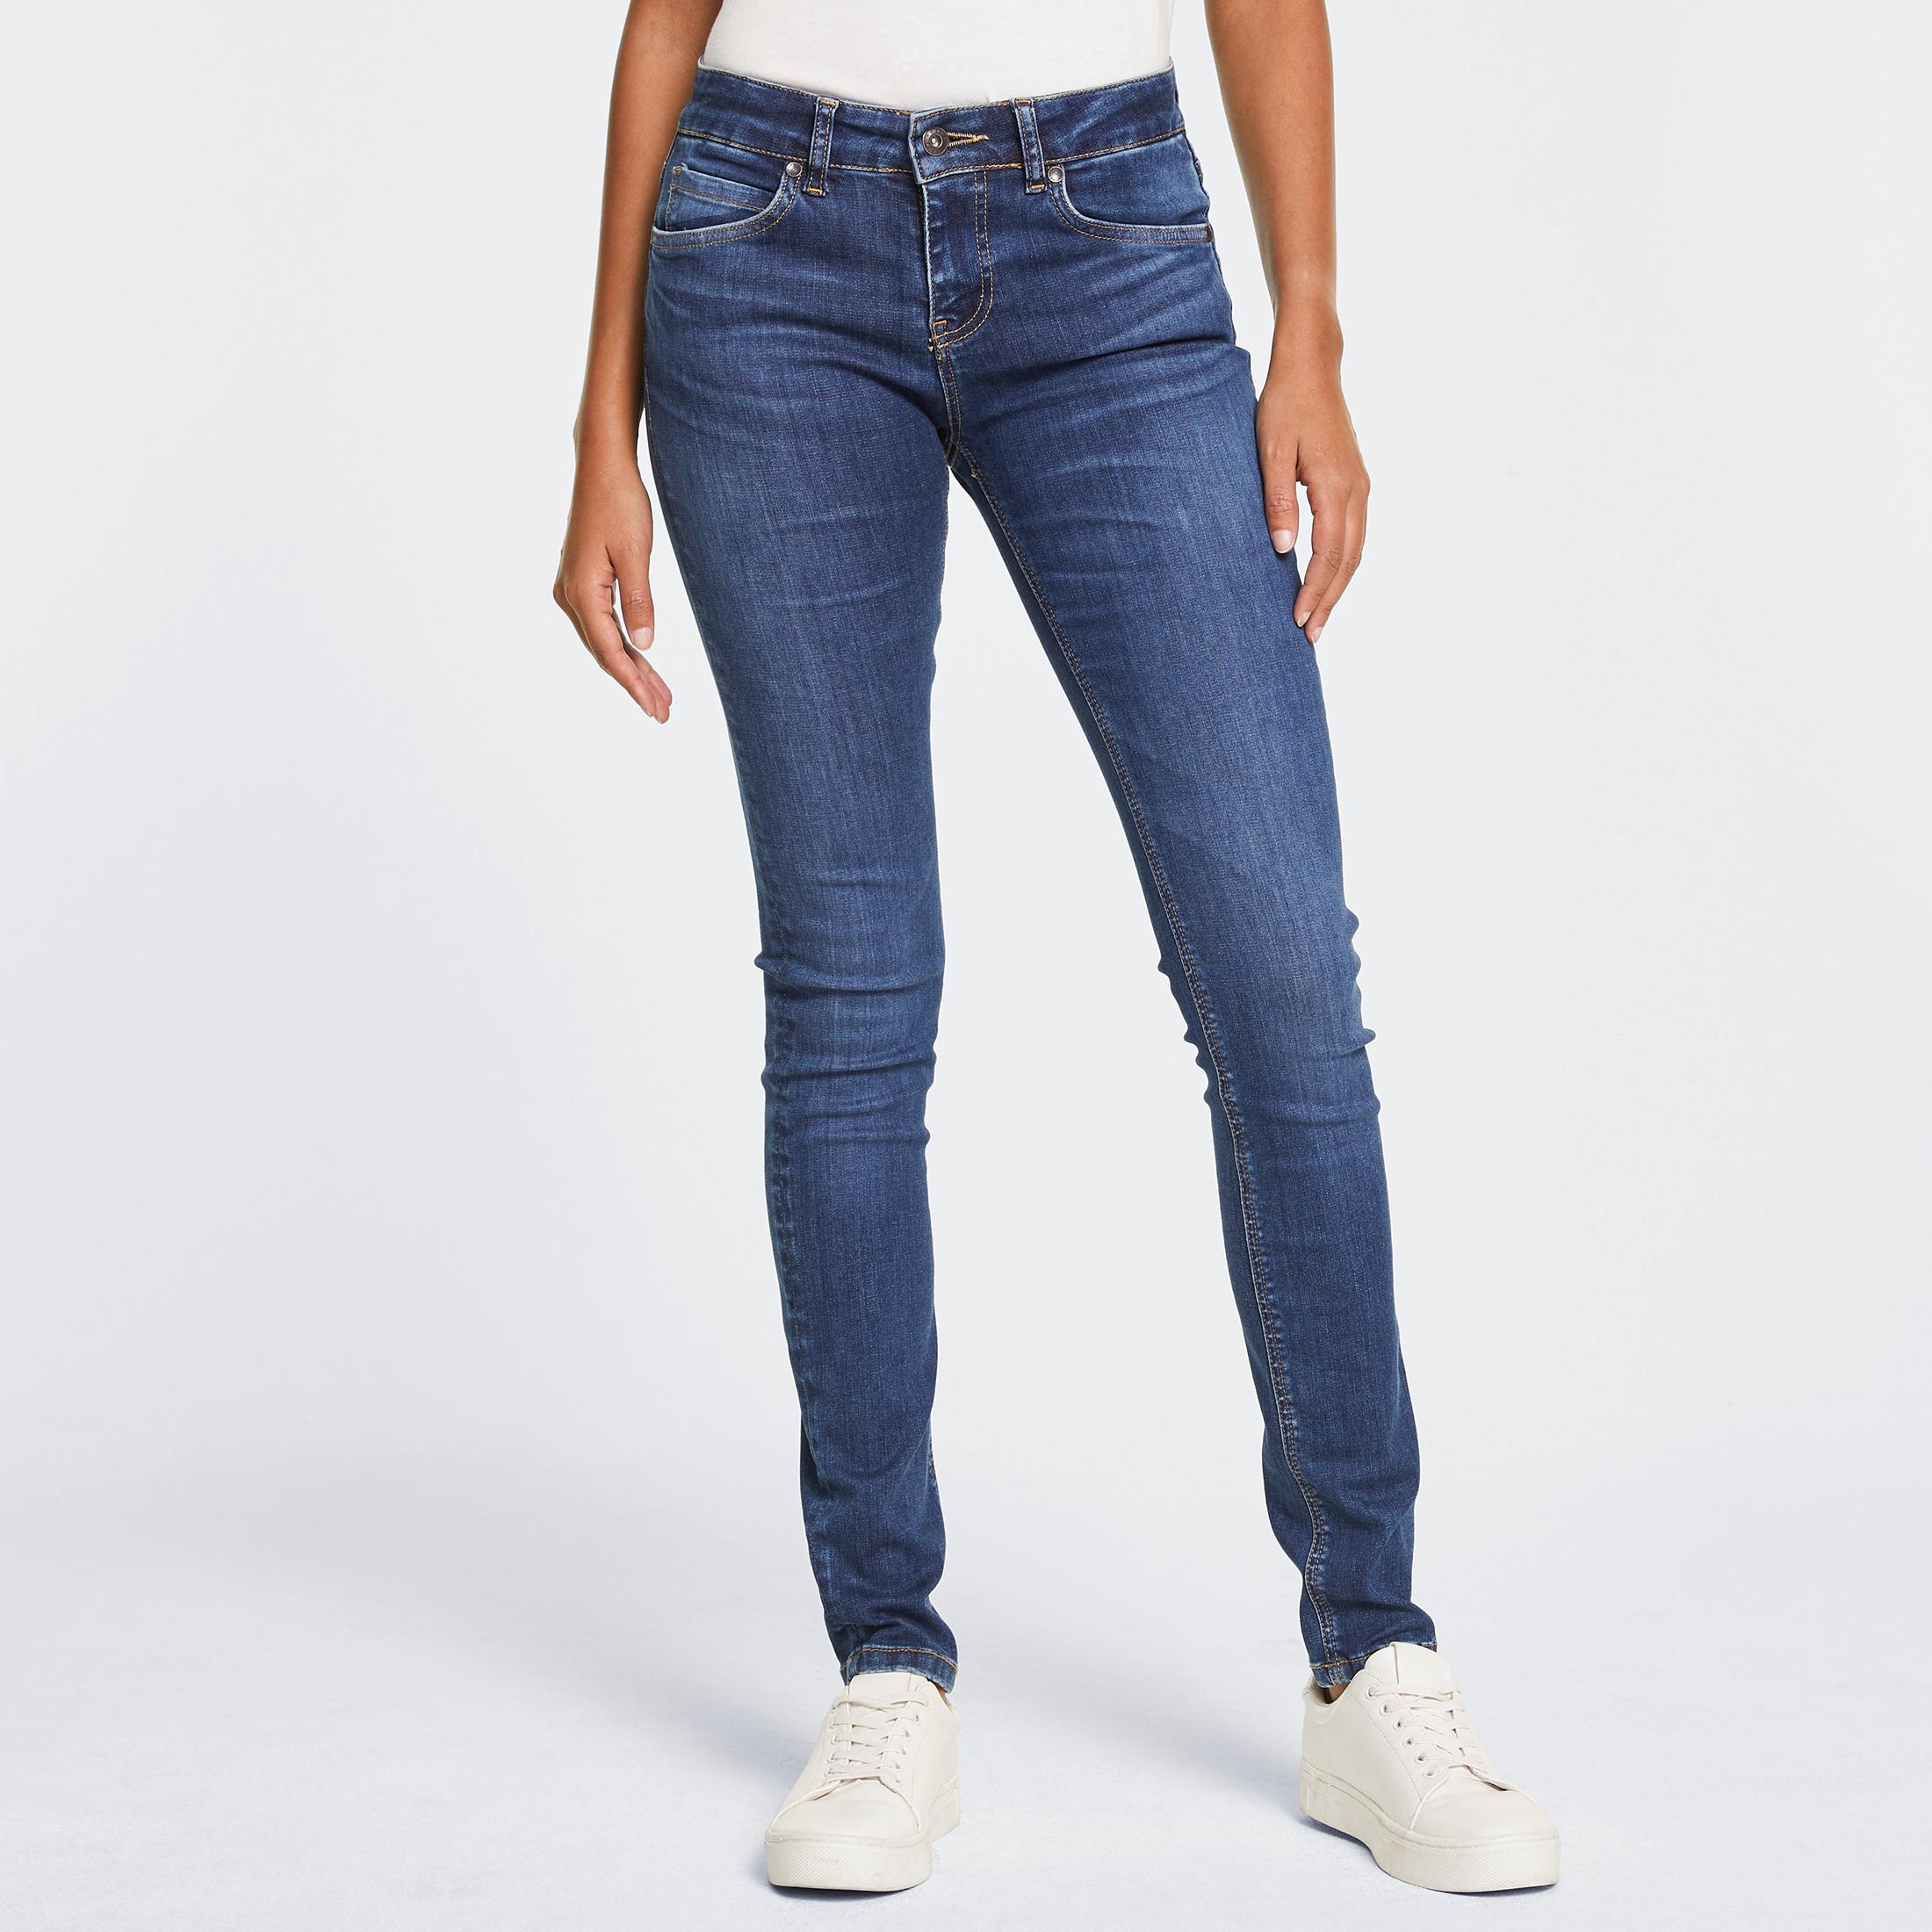 Blue Jeans KAR-LIE